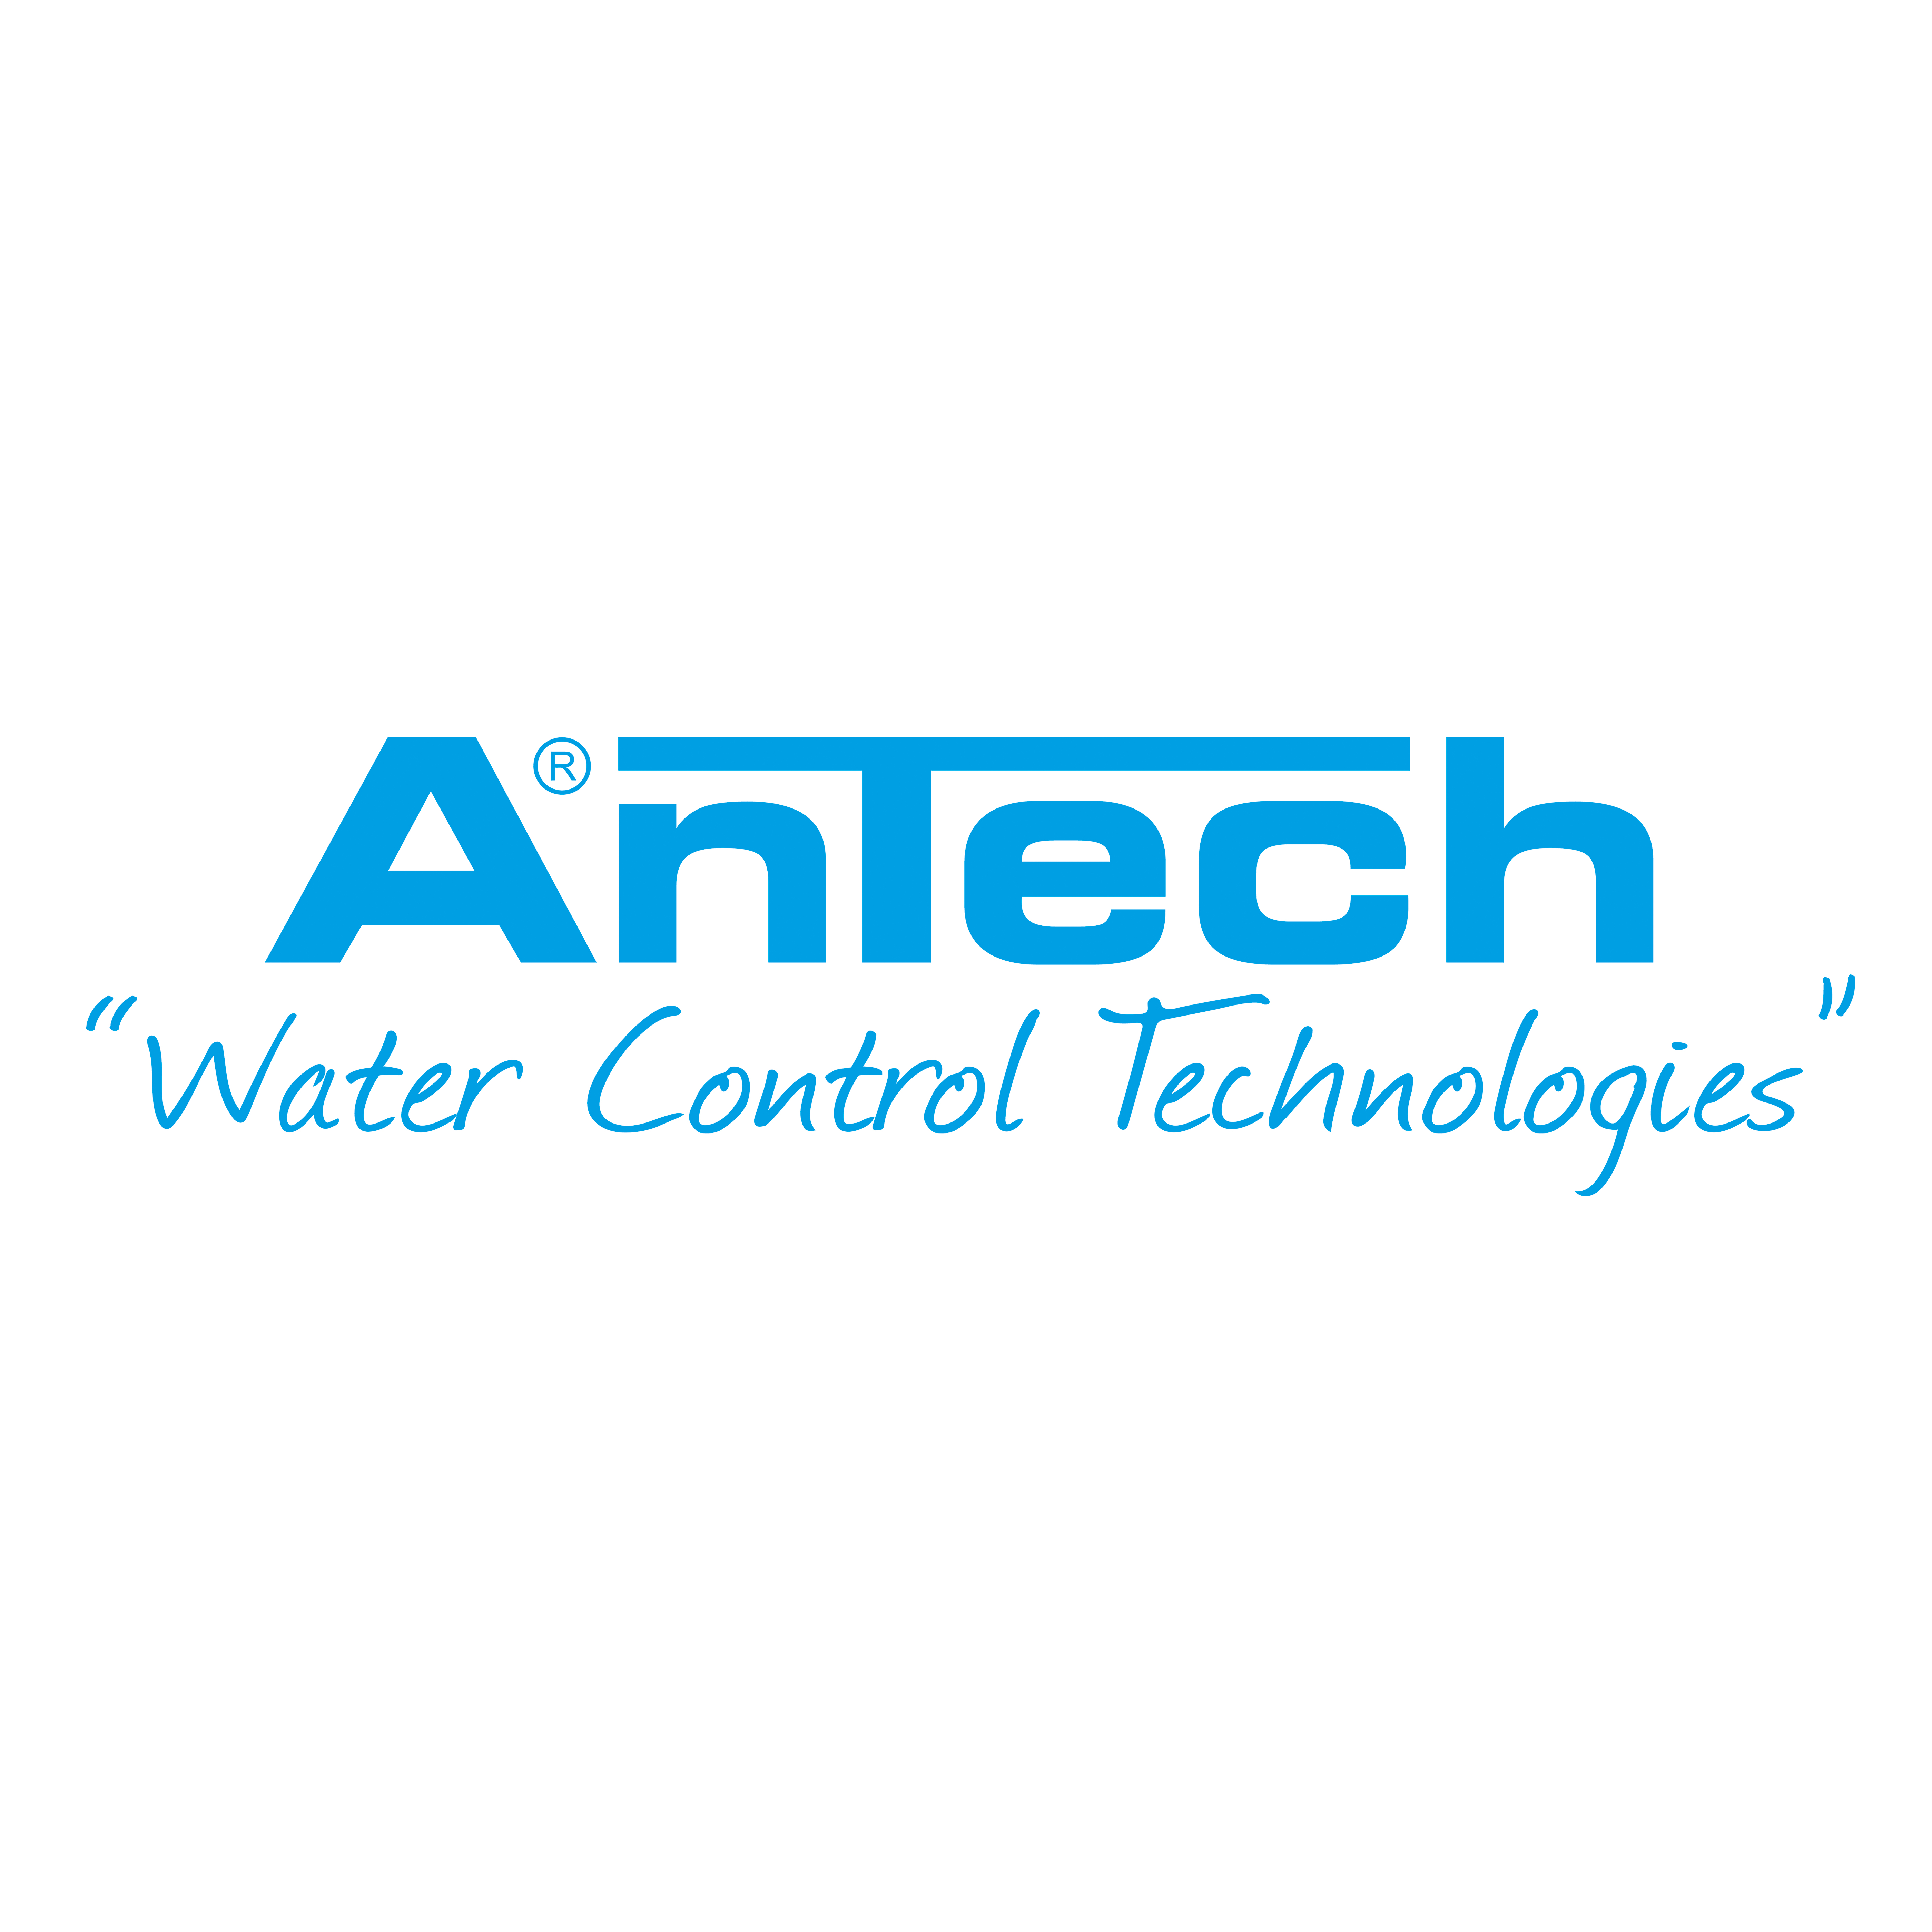 En-El-Sa Endustriyel Elektronik insaat Taahhut Sanayi Ticaret Ltd Sti (AnTech Water Control Technologies)